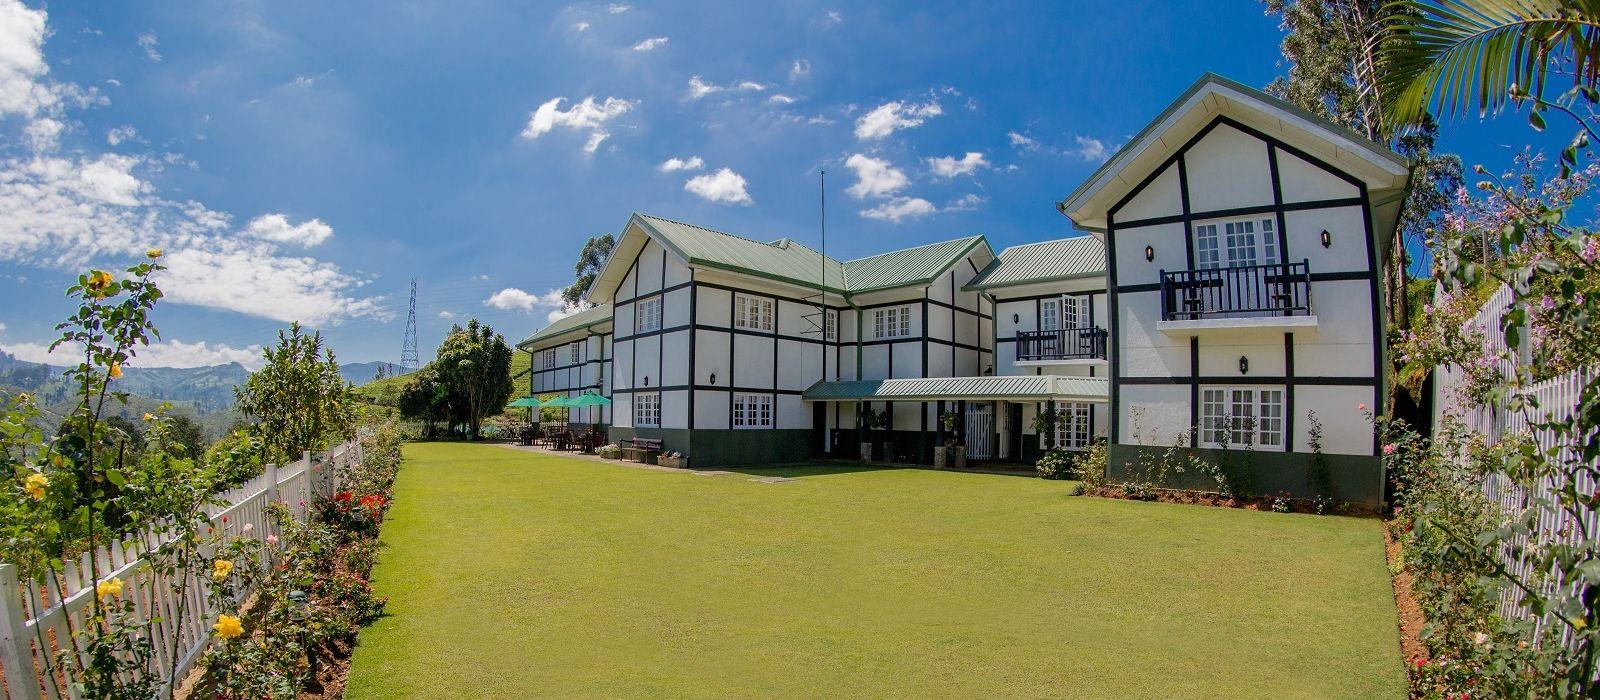 Hotel Langdale by Amaya Sri Lanka